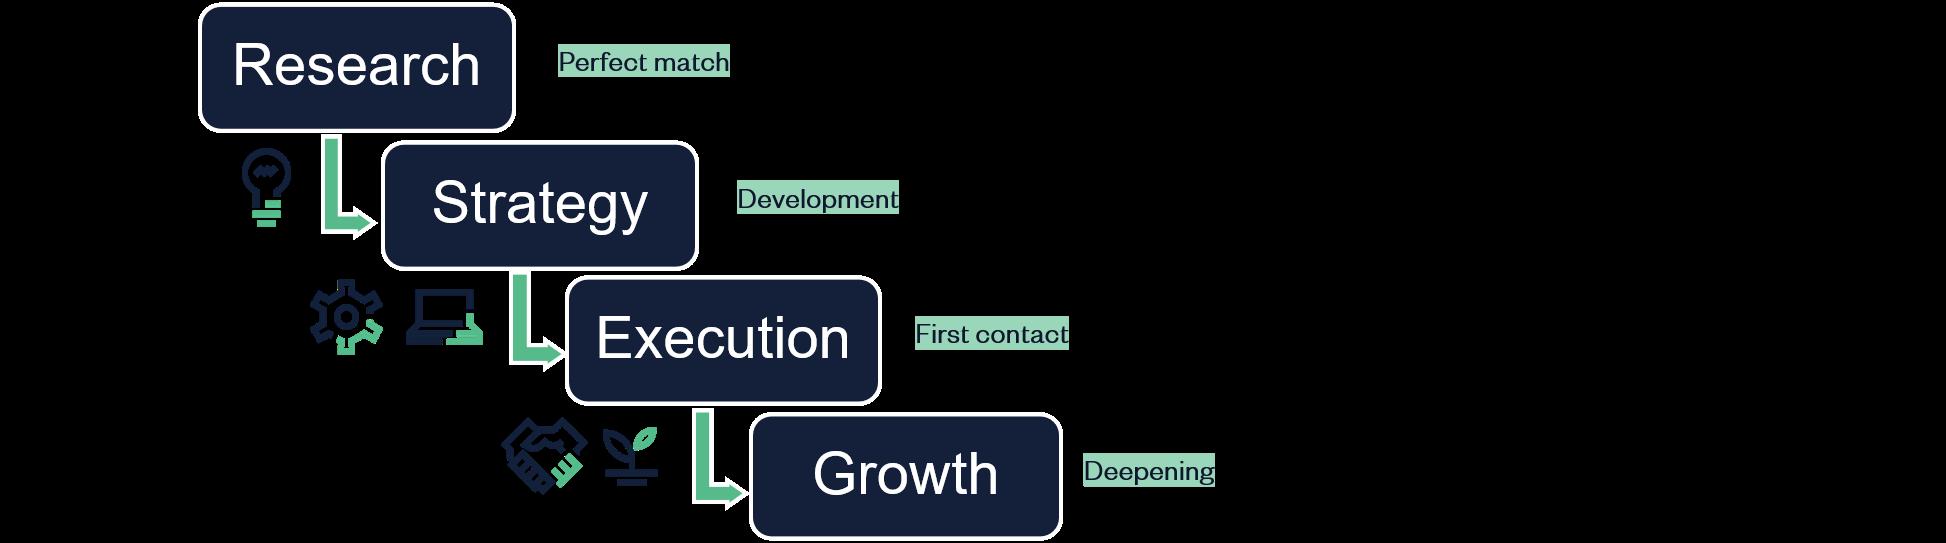 Channel marketing illustration